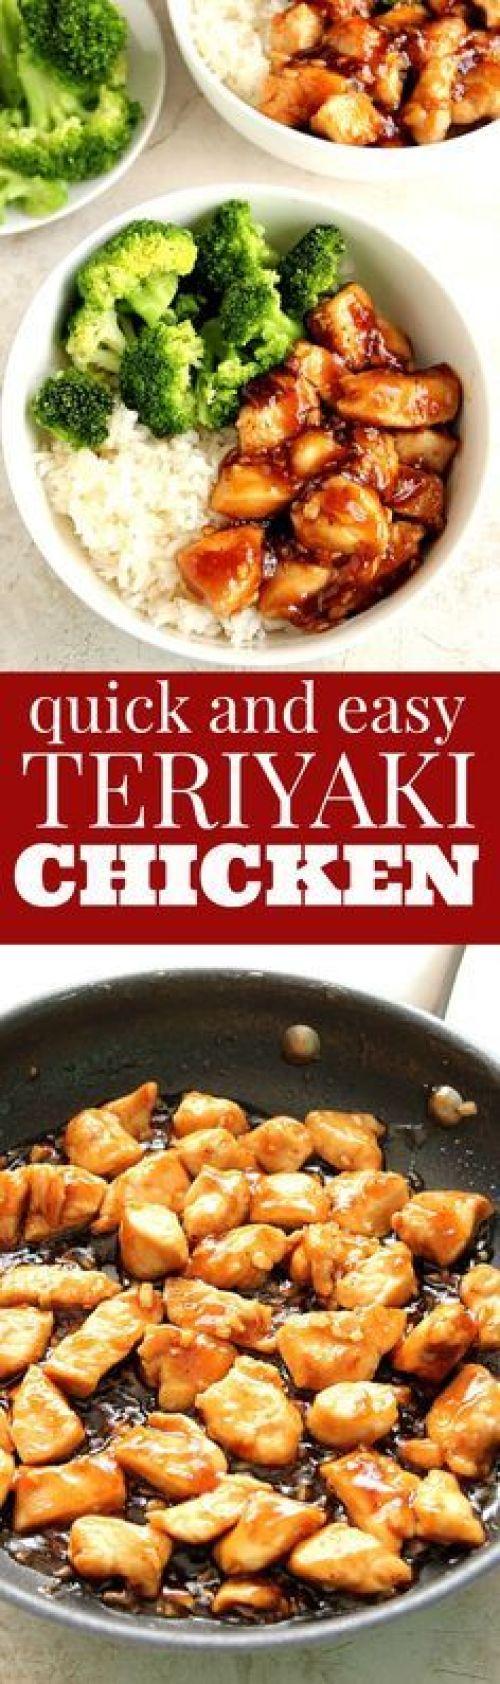 Quick Dinner Ideas - Quick and Easy Teriyaki Chicken Dinner Recipe via Crunchy Creamy Sweet